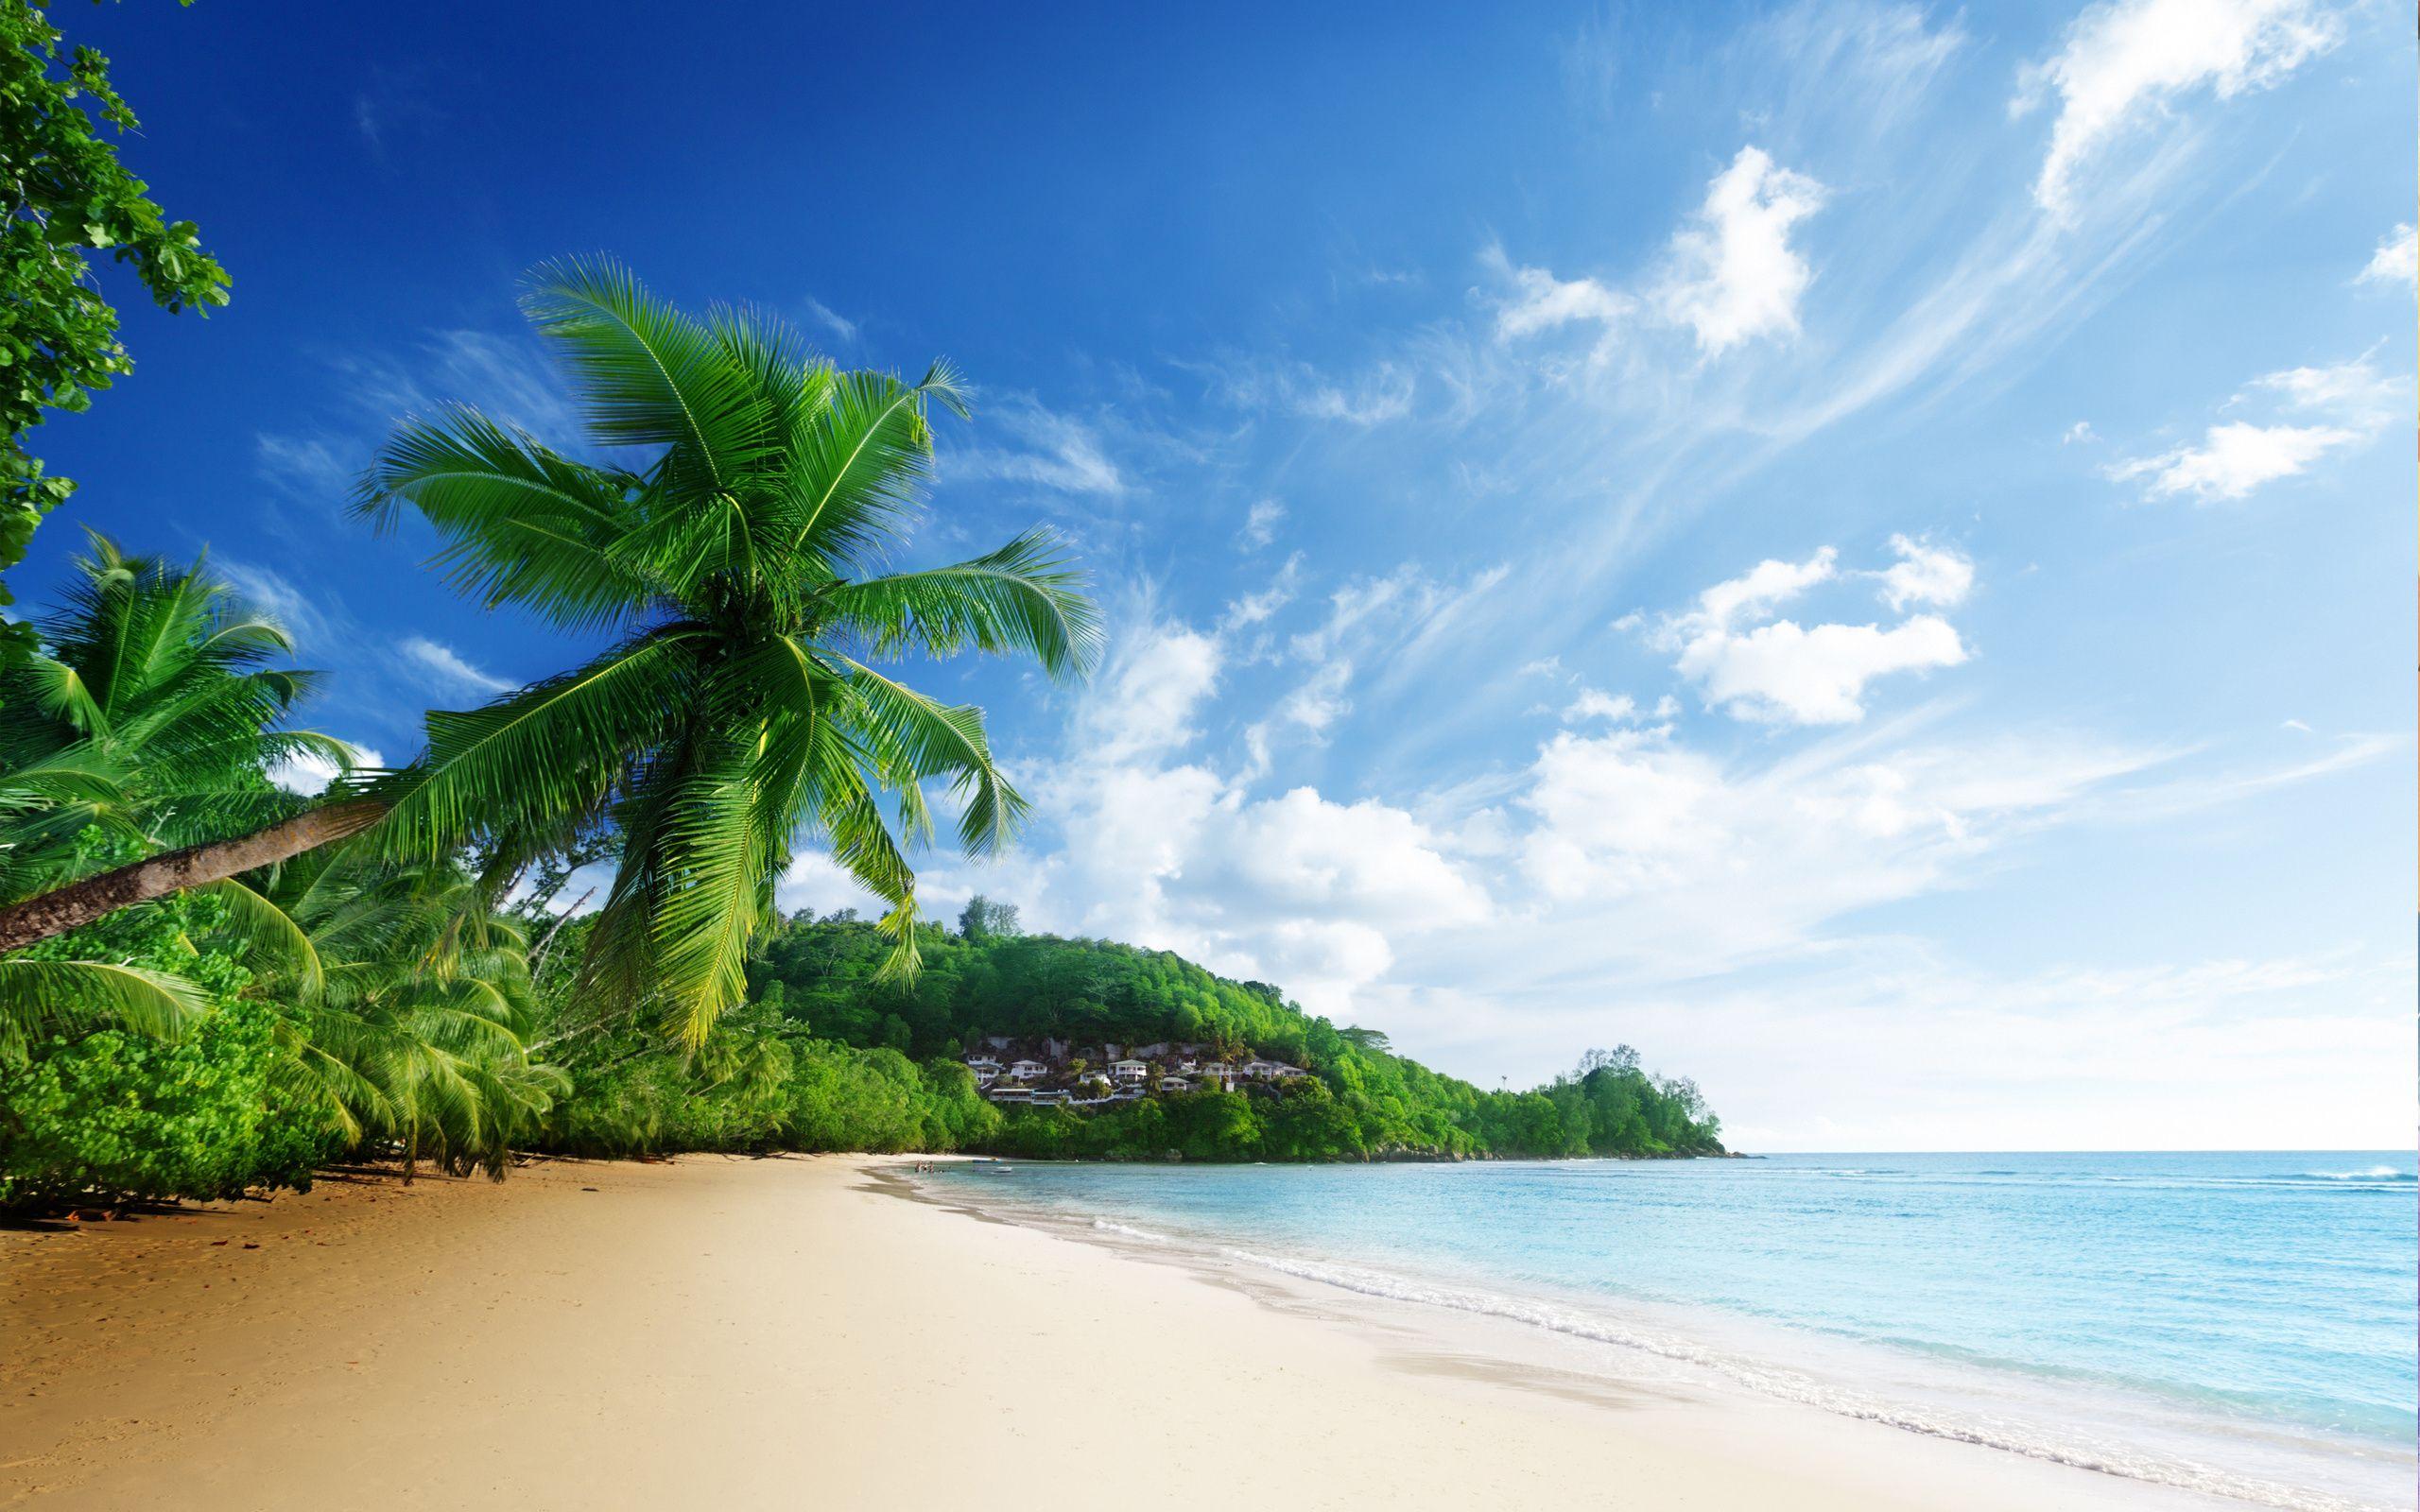 Fond d cran hd le paradisiaque fond d 39 cran hd gratuit http all - Image d ile paradisiaque ...